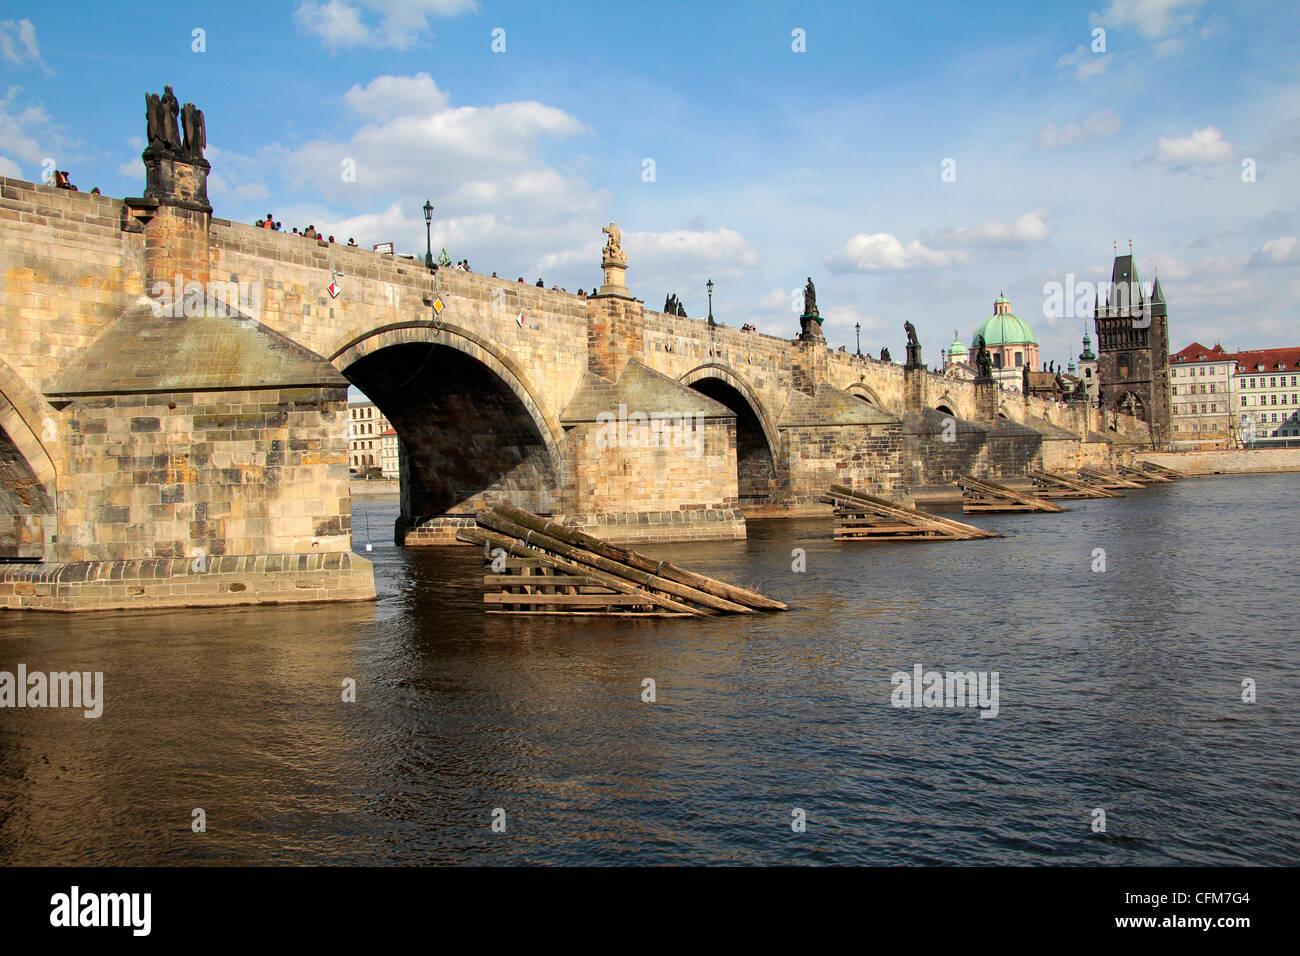 Charles Bridge over the River Vltava, UNESCO World Heritage Site, Prague, Czech Republic, Europe - Stock Image